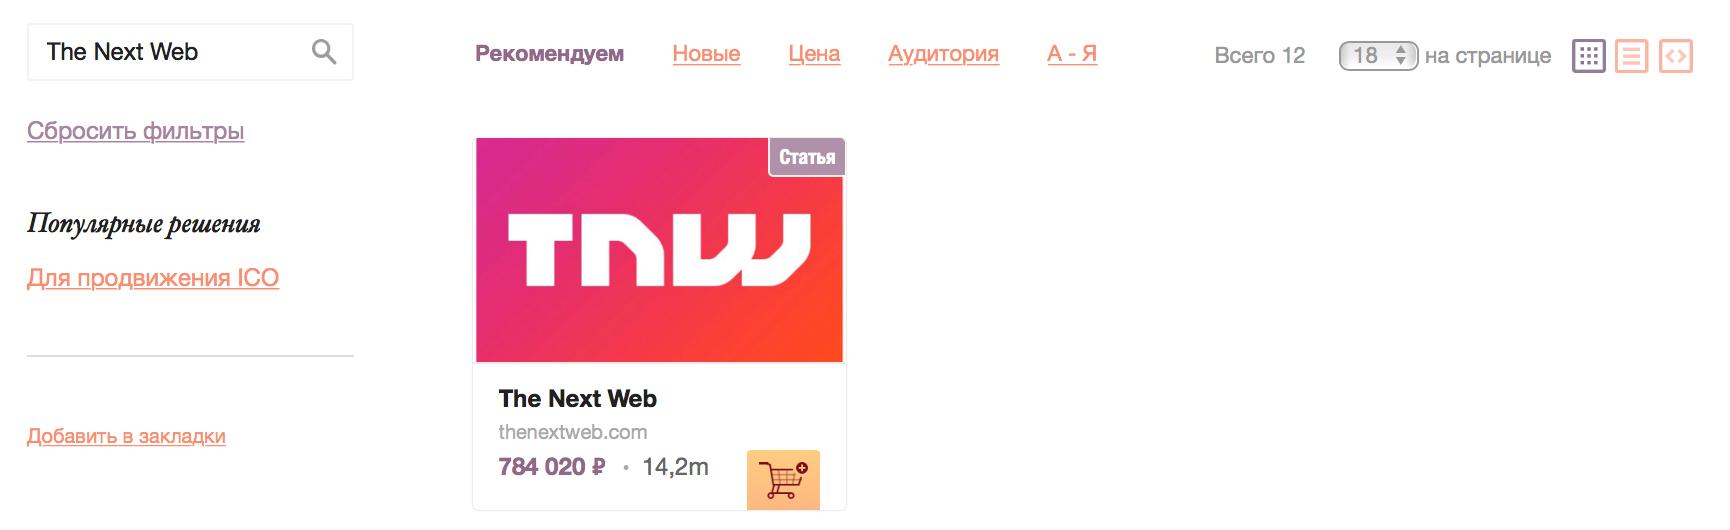 Расценки на нативную рекламу в The Next Web